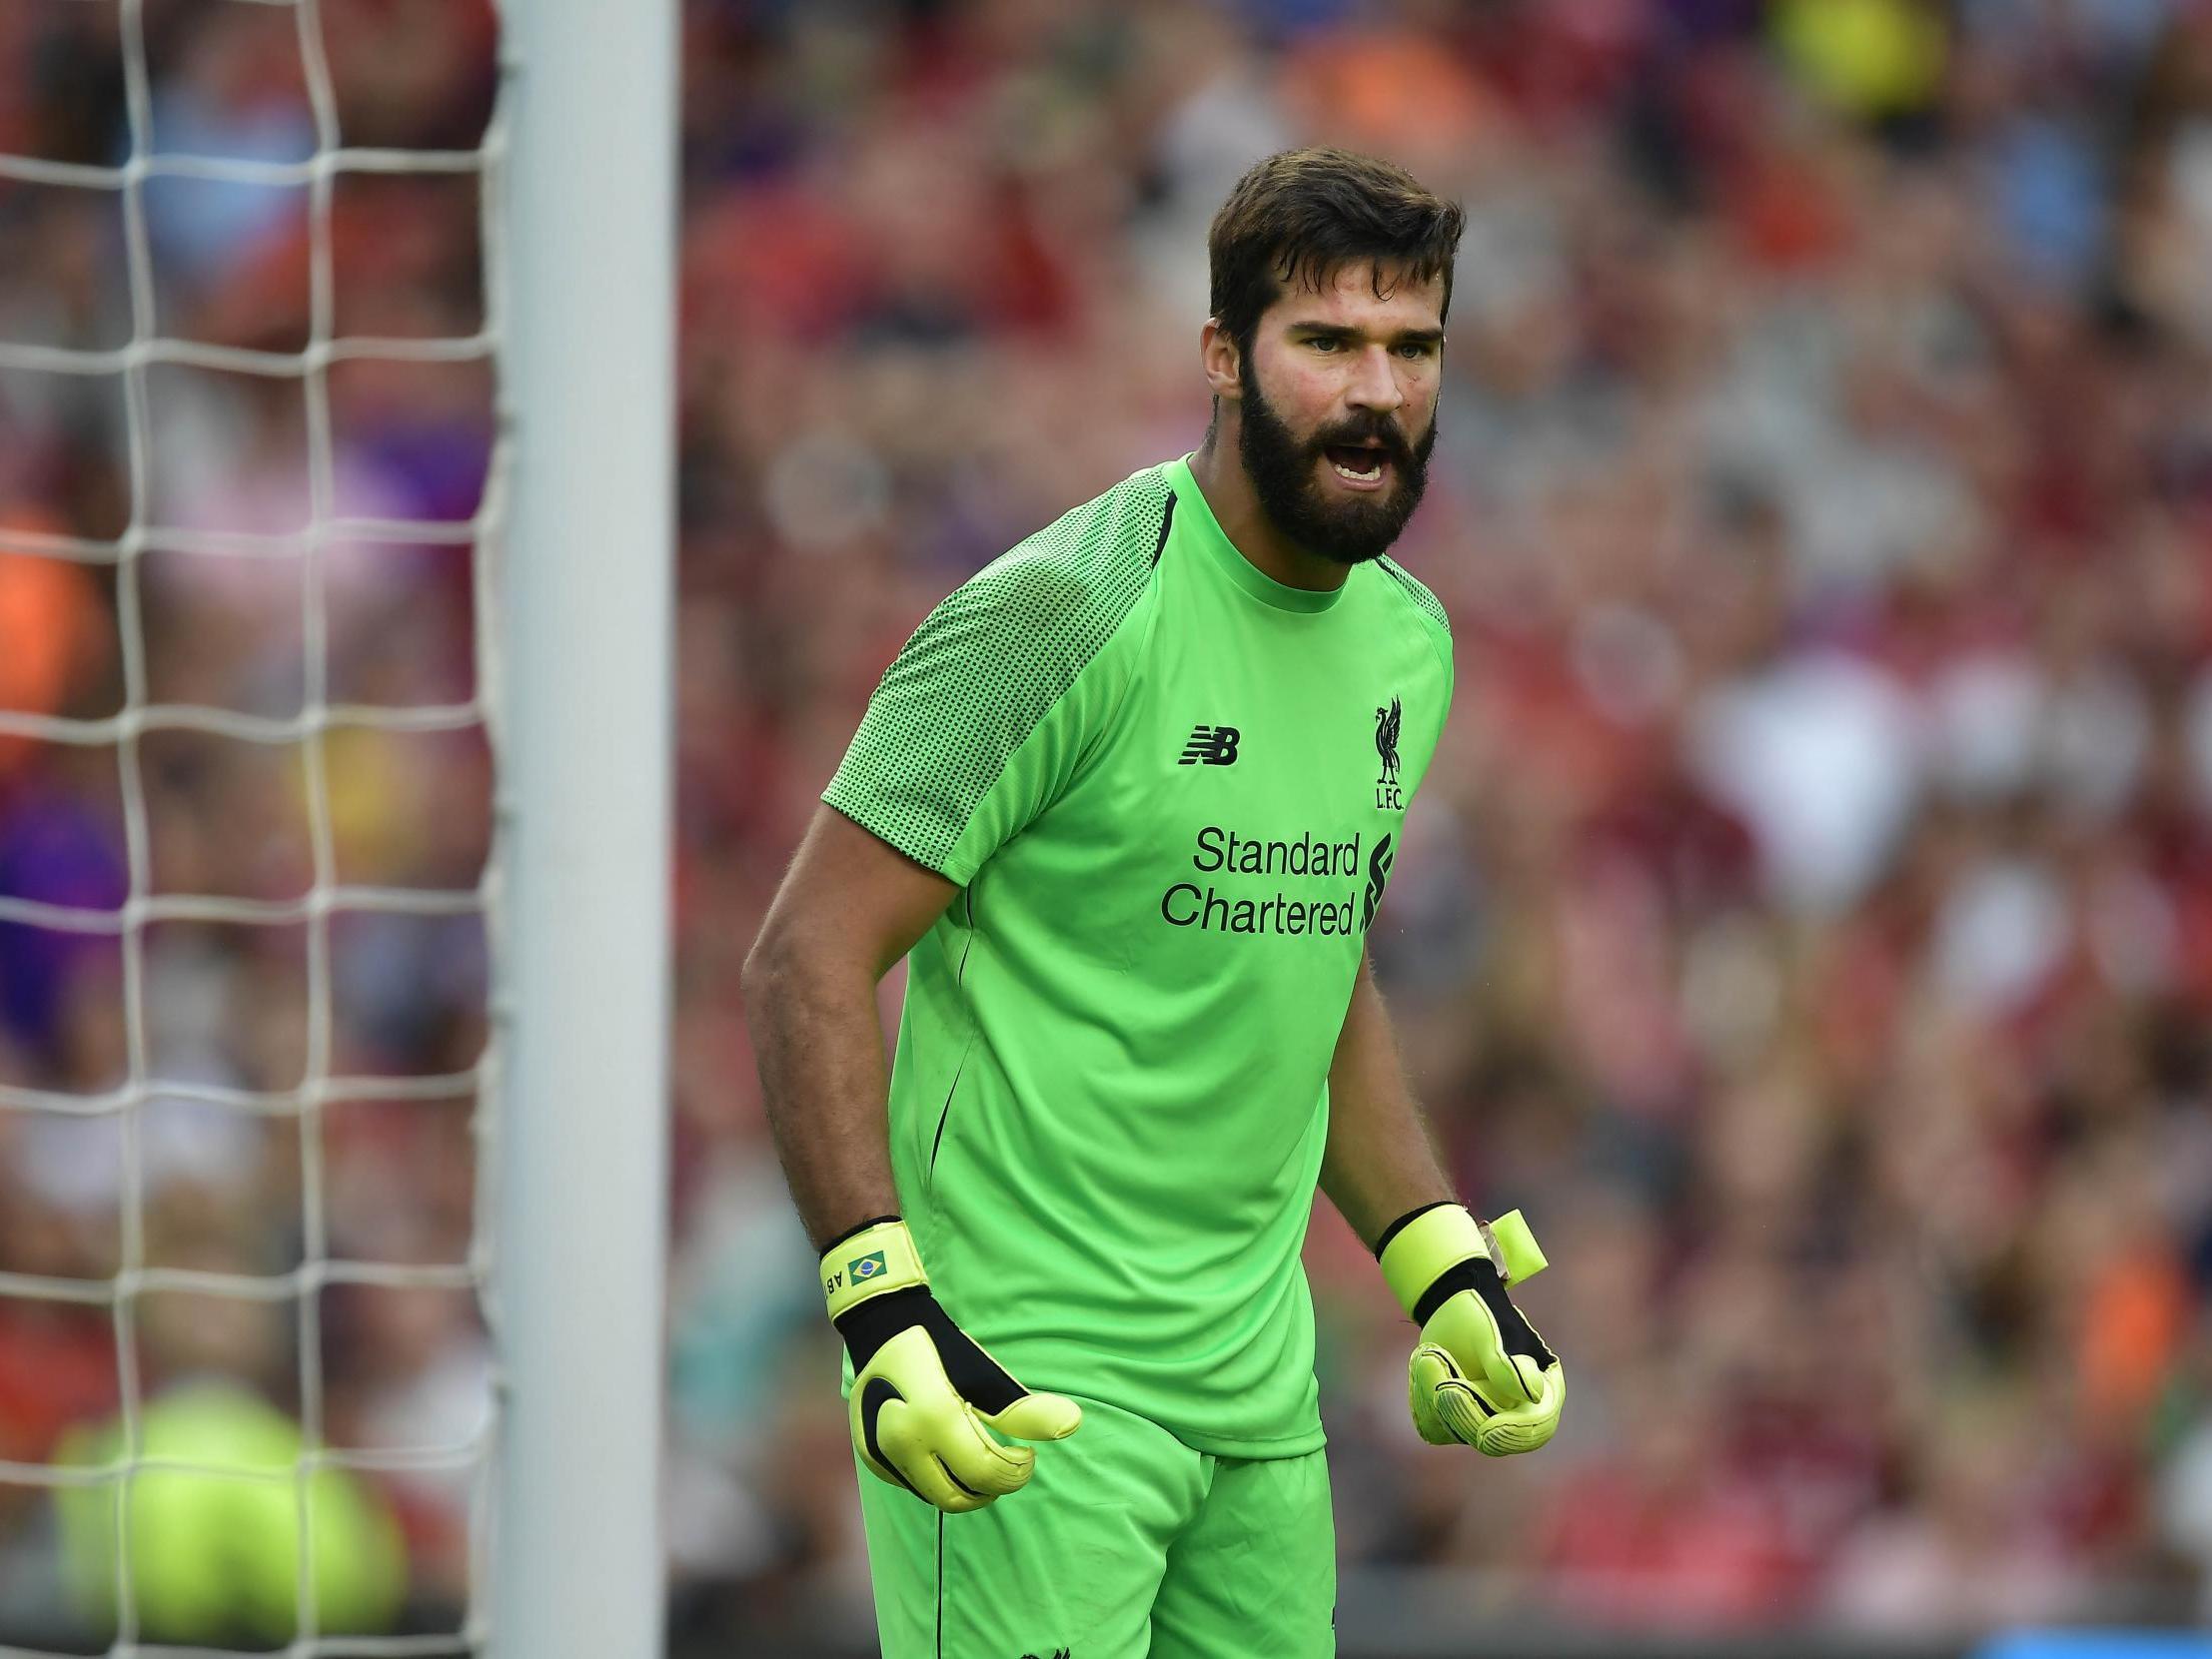 Jurgen Klopp predicts quick Premier League transition for Liverpool goalkeeper Alisson Becker